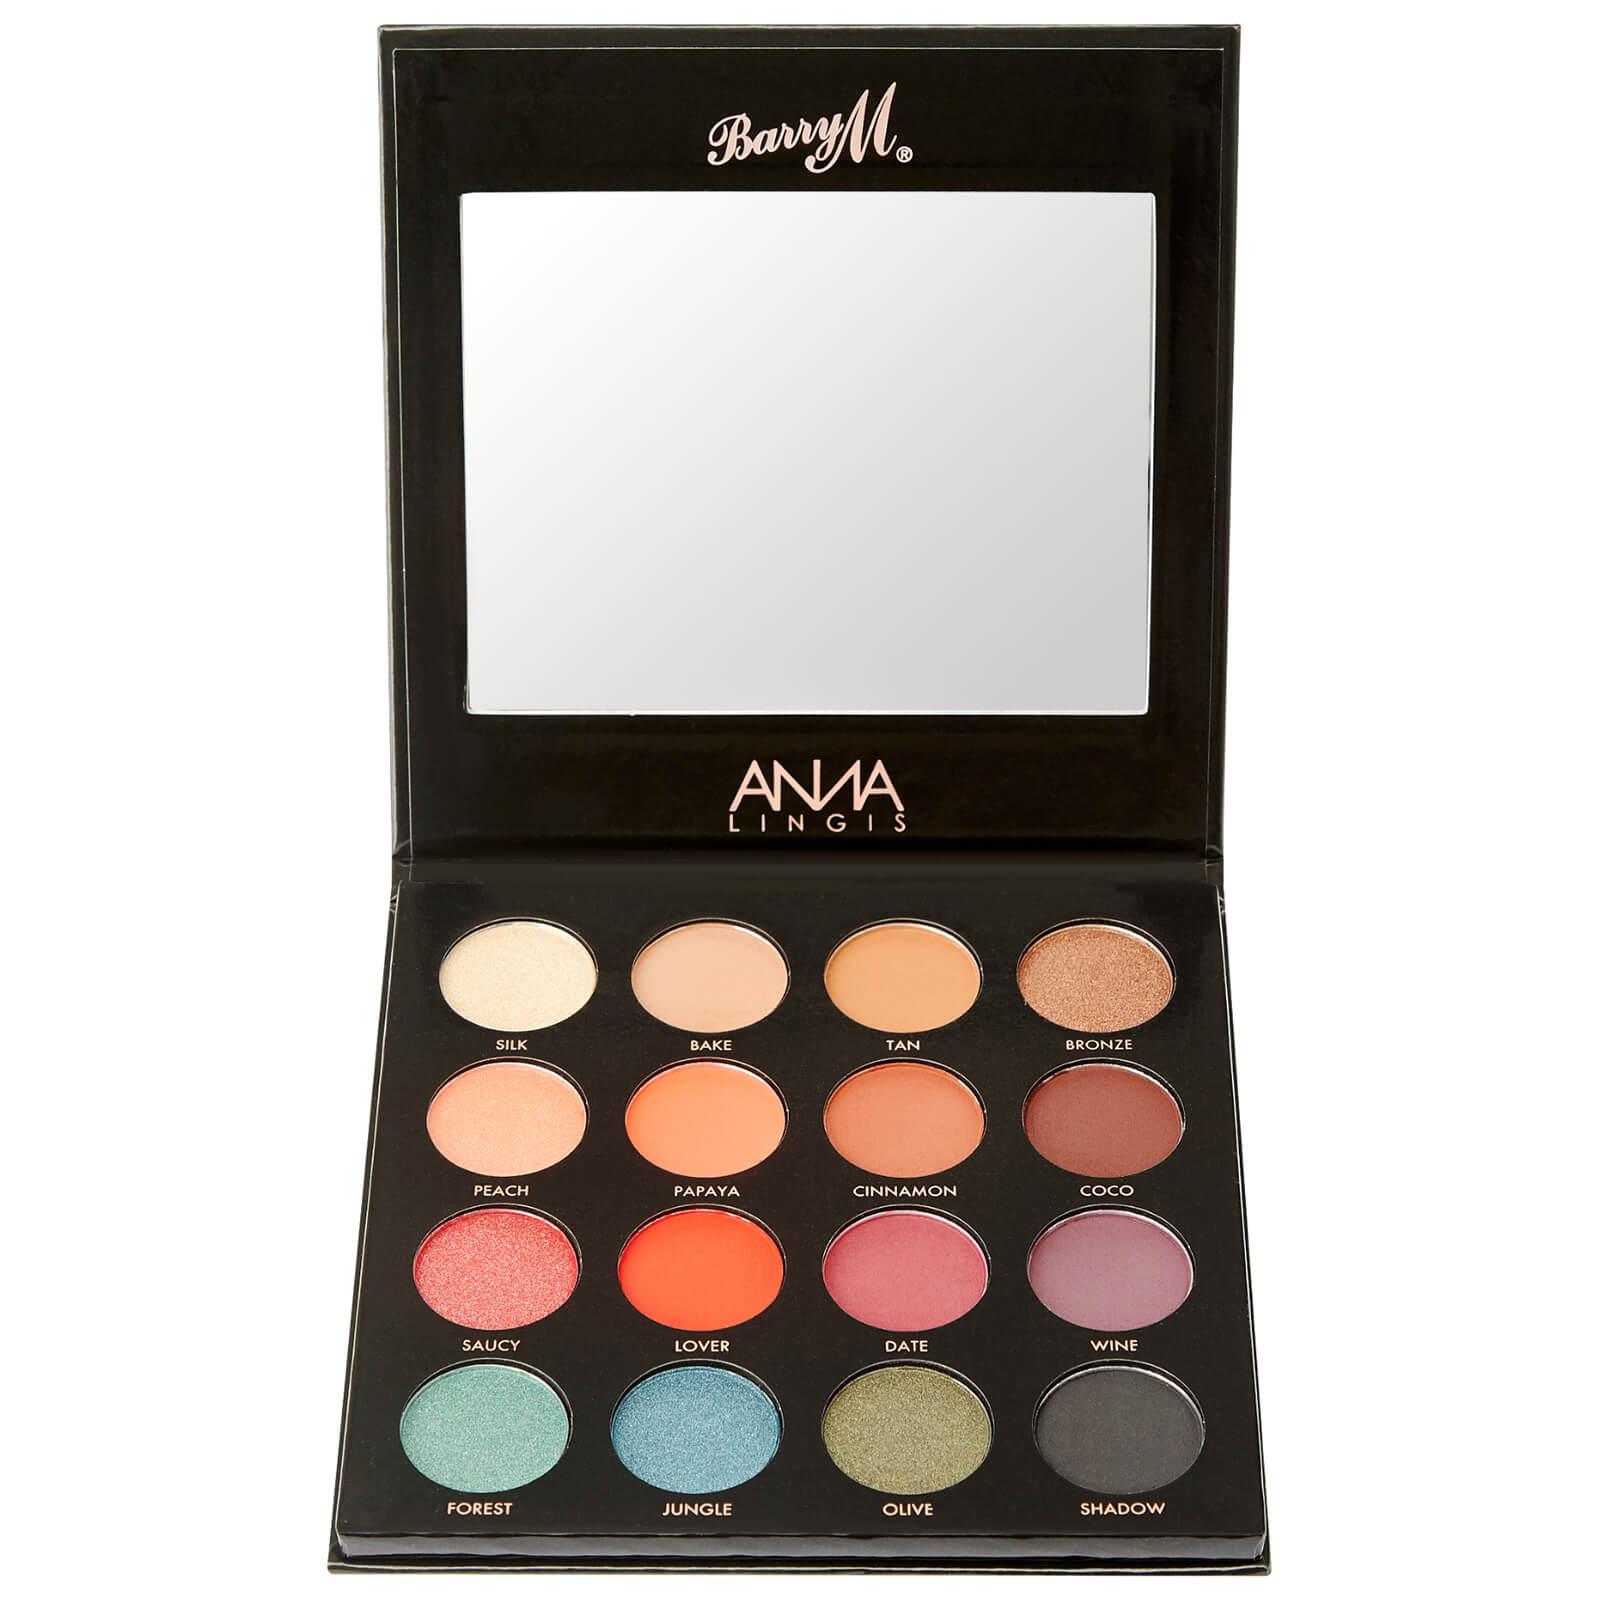 Barry M Cosmetics Anna Lingis Eyeshadow Palette 15.2g